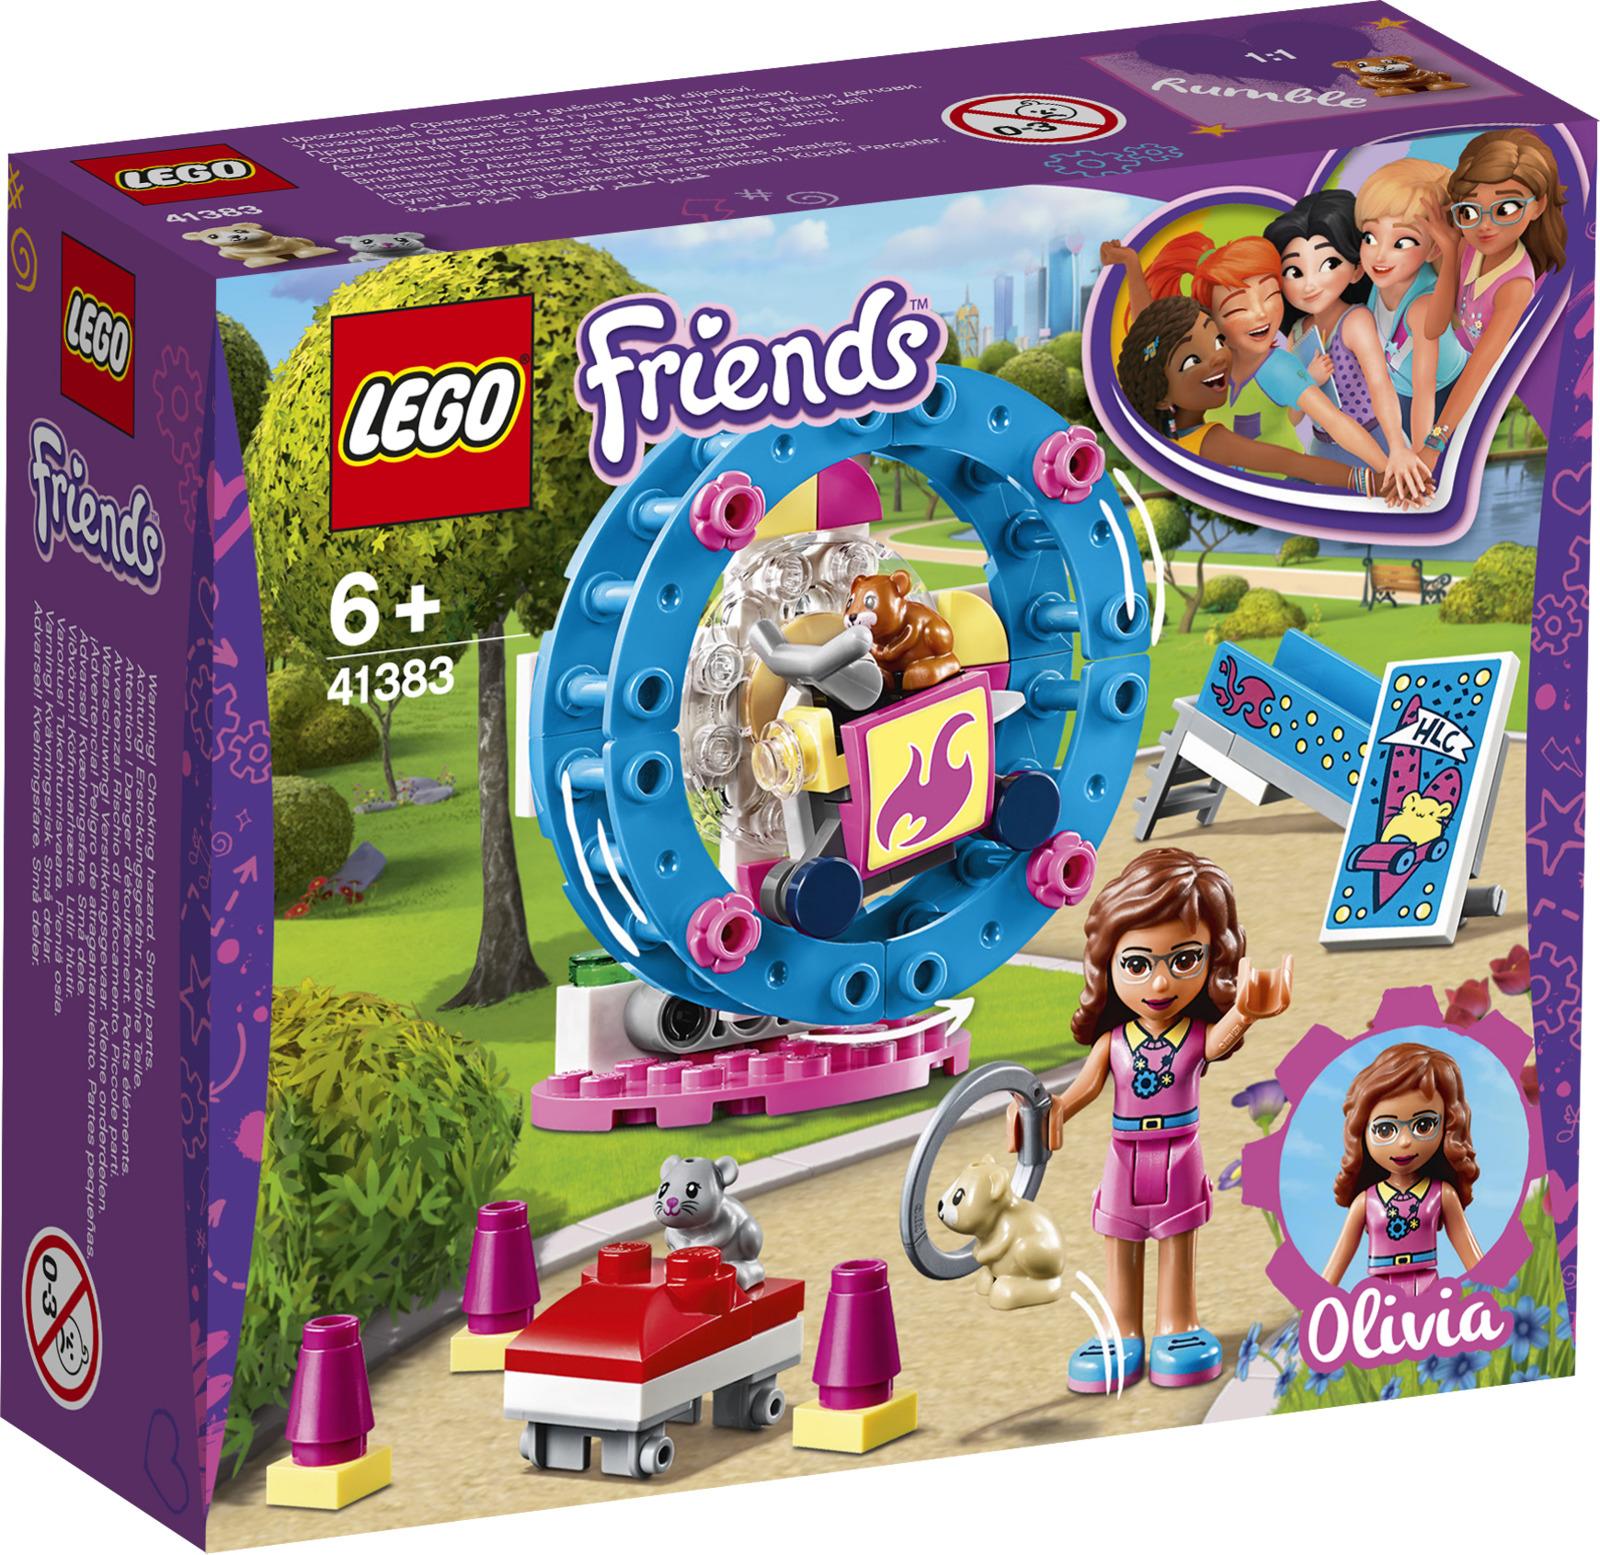 LEGO Friends 41383 Игровая площадка для хомячка Оливии Конструктор lego friends выставка щенков игровая площадка